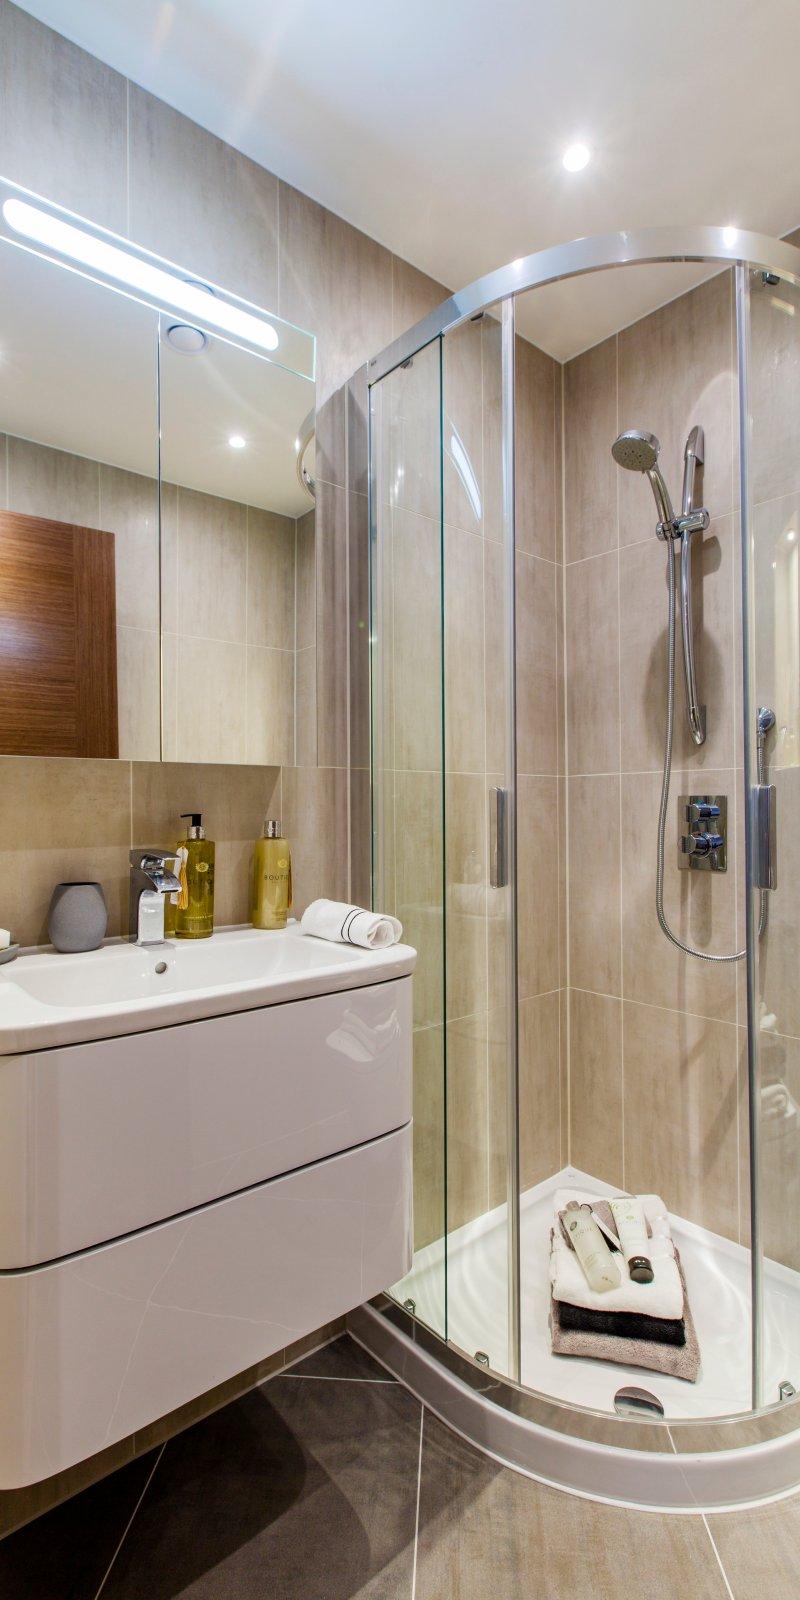 Luxury London apartments get the Roca bathroom treatment